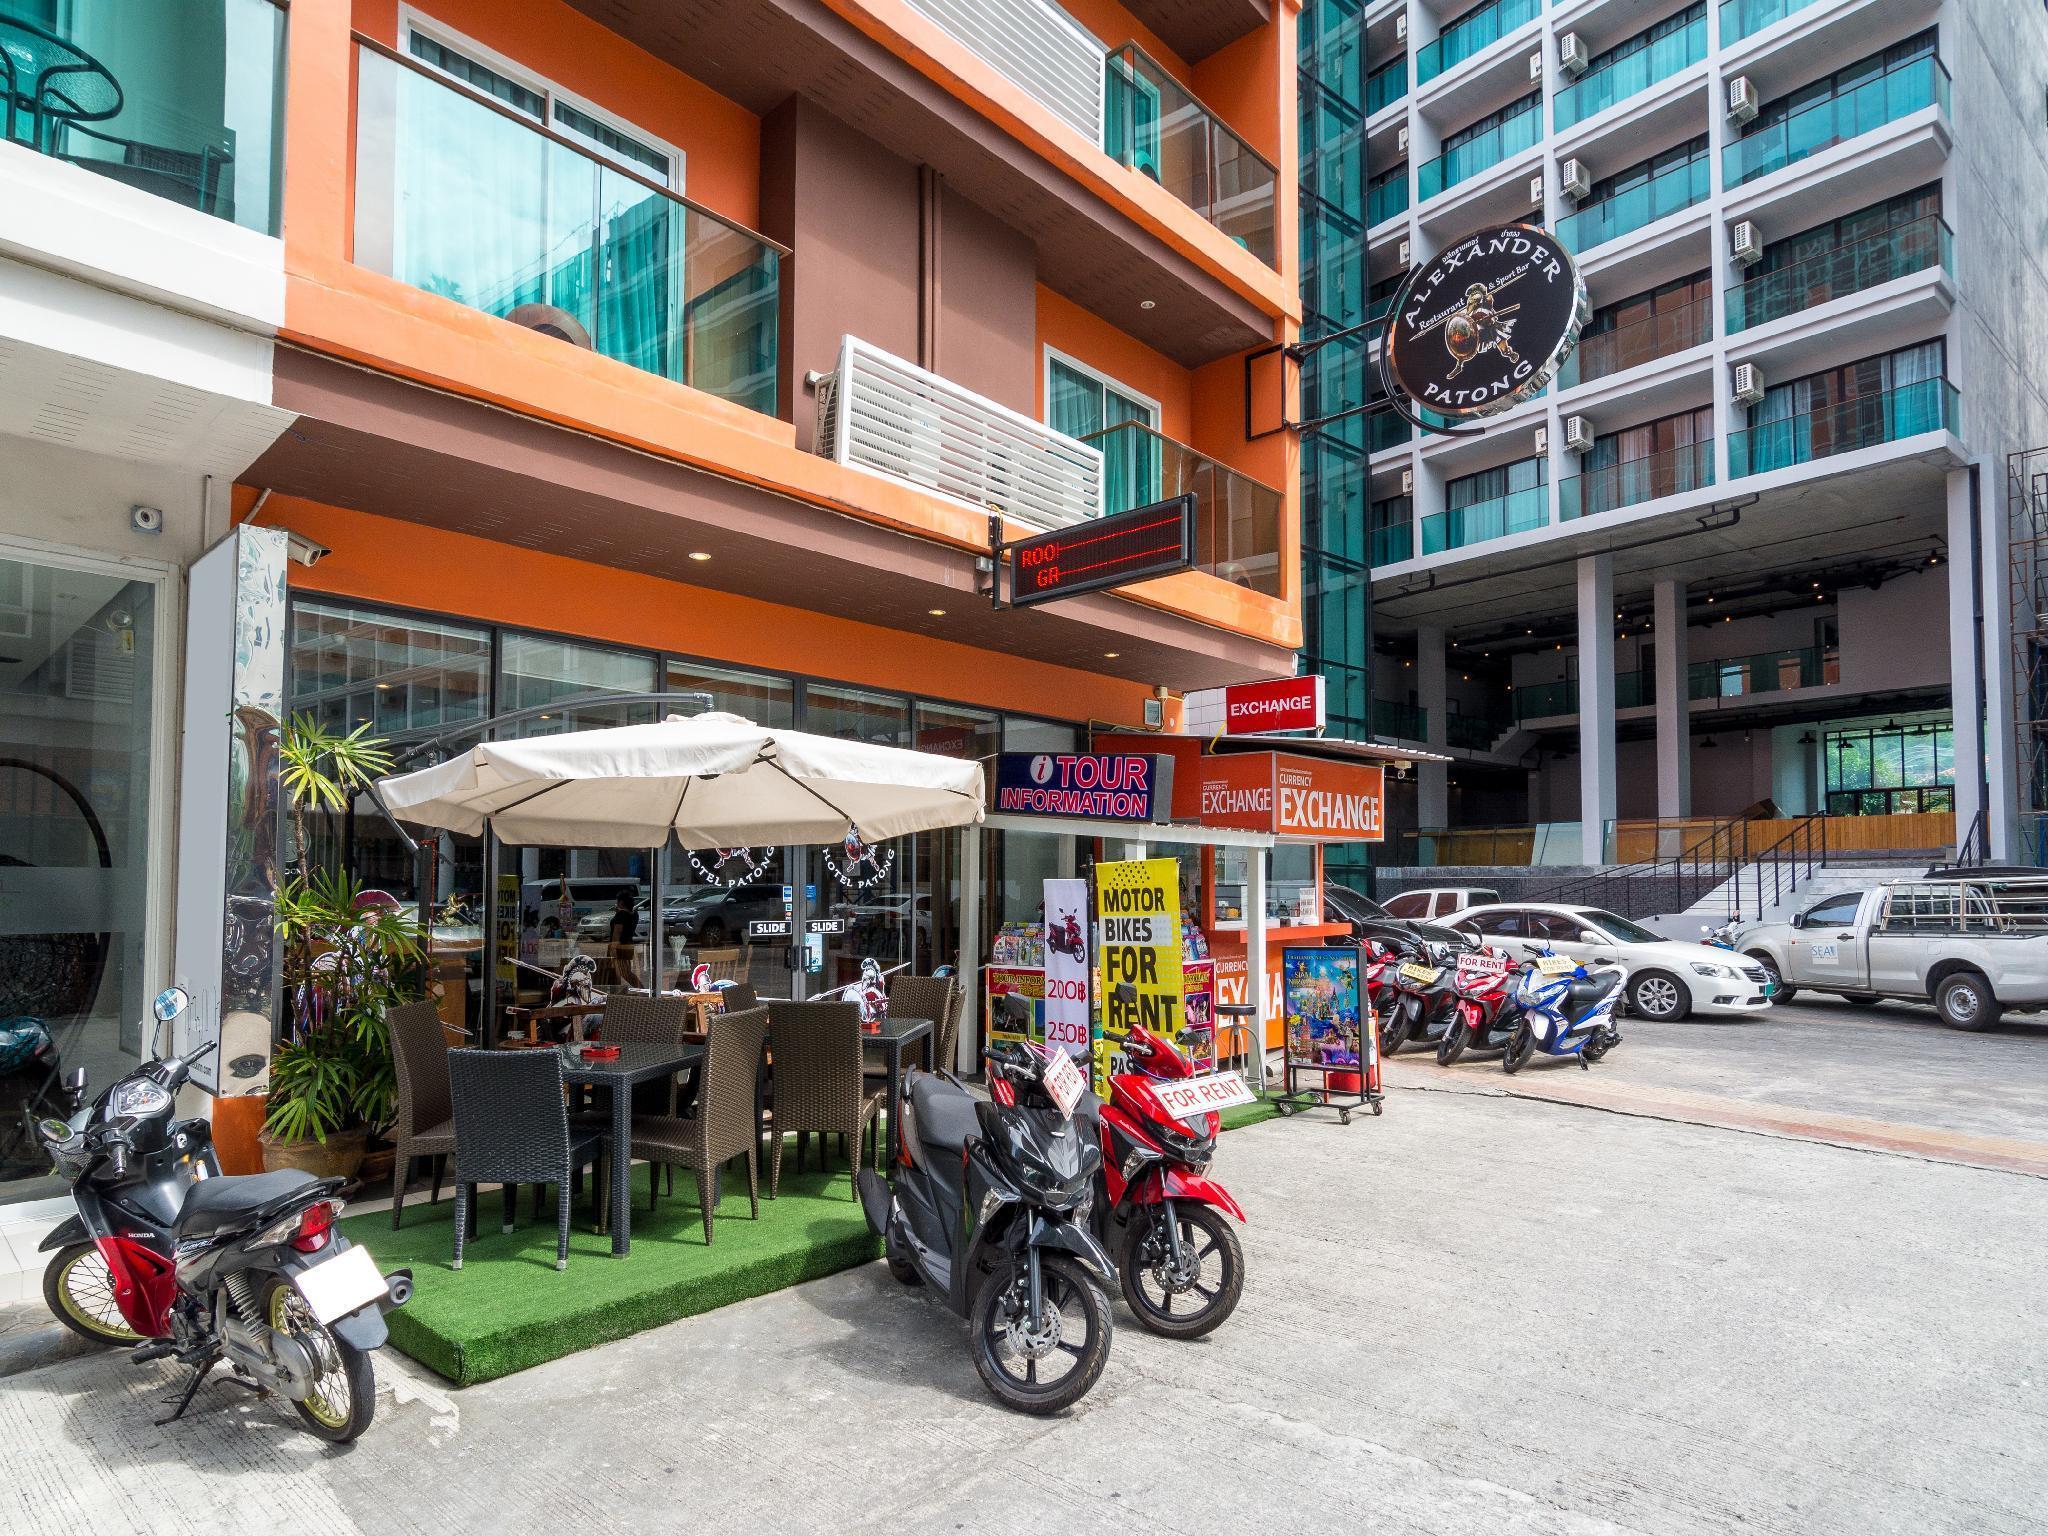 Alexander Hotel Patong โรงแรมอเล็กซานเดอร์ ป่าตอง